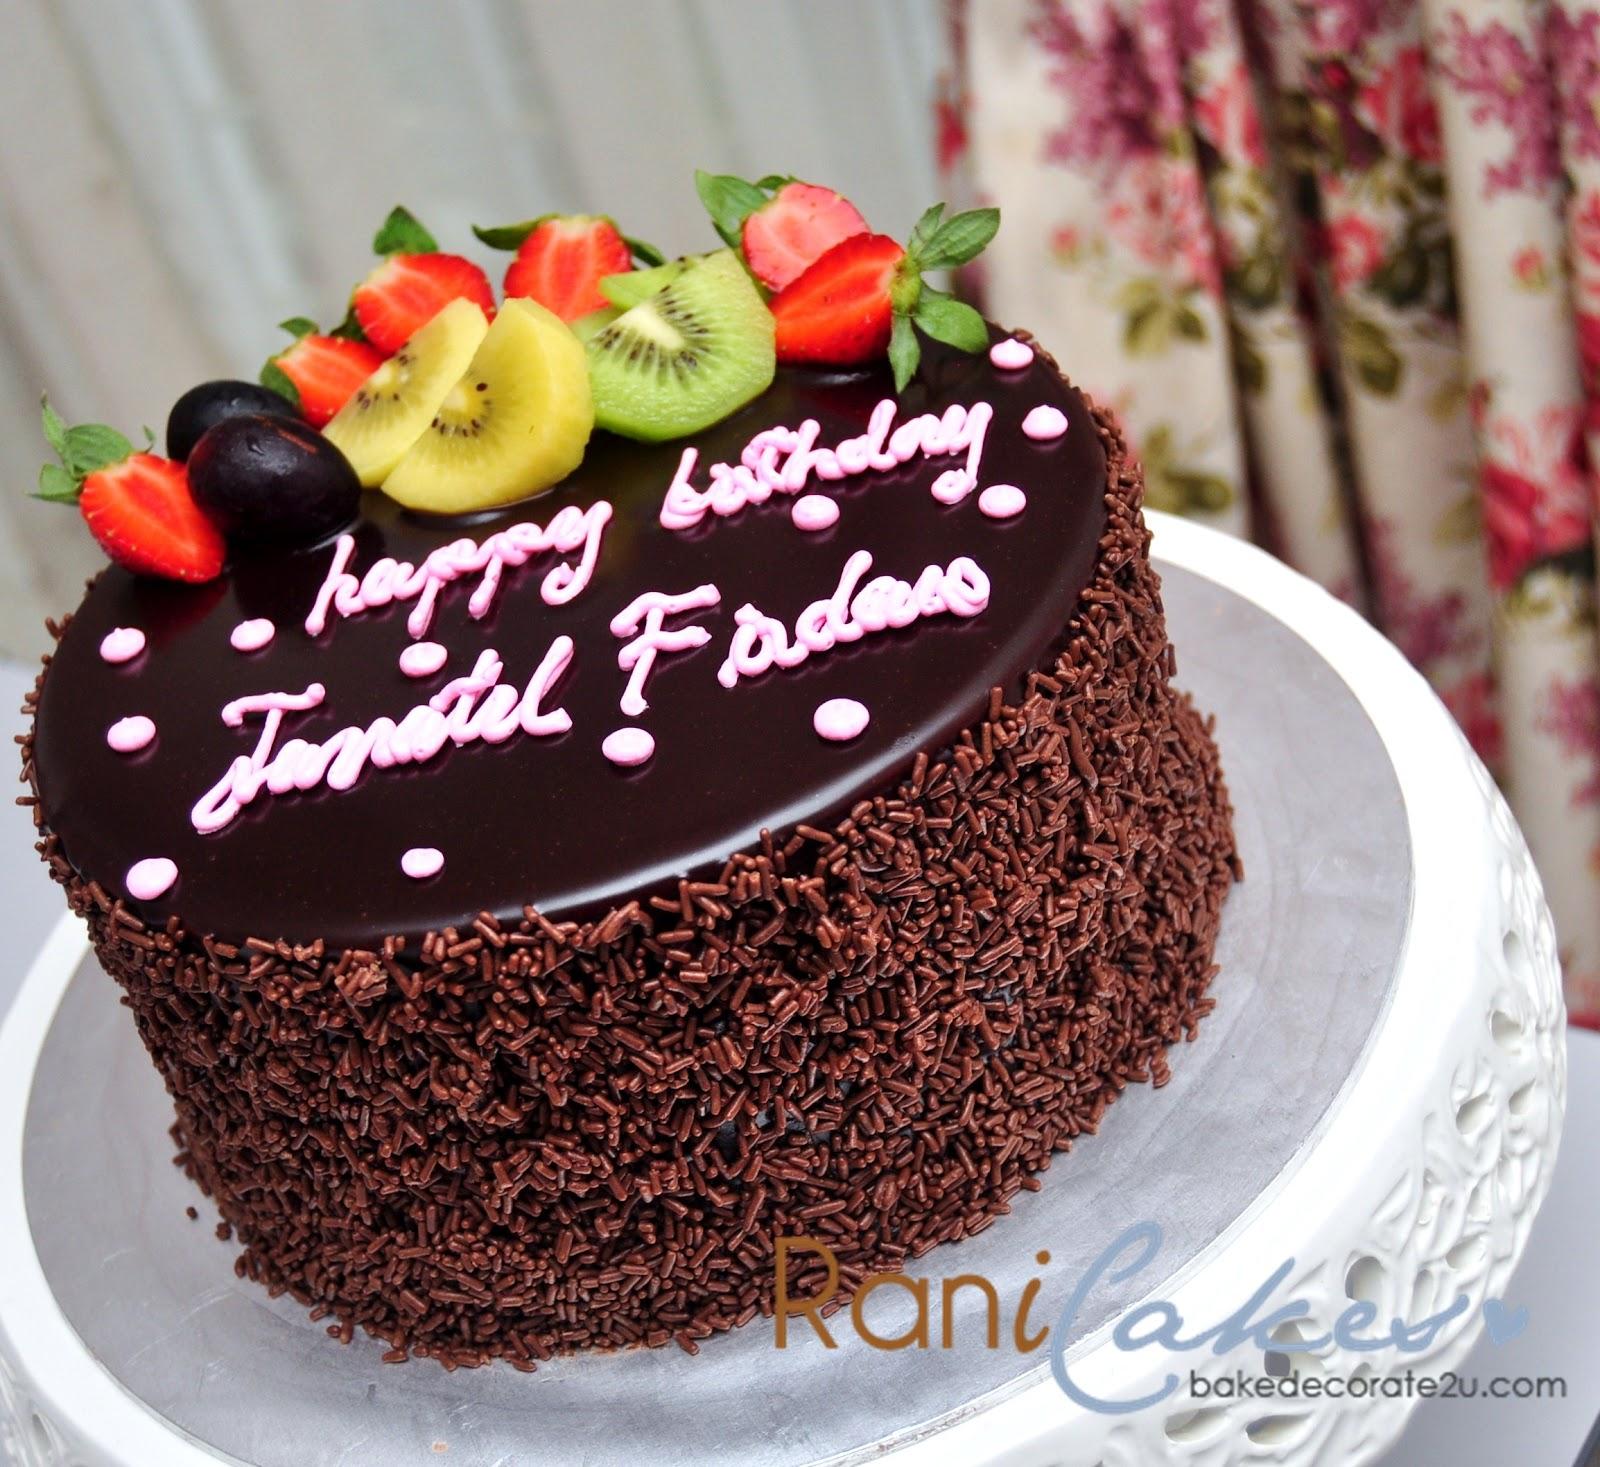 Cake Images Rani : Pin Rani Canglun Delights Birthday Cake Cake on Pinterest